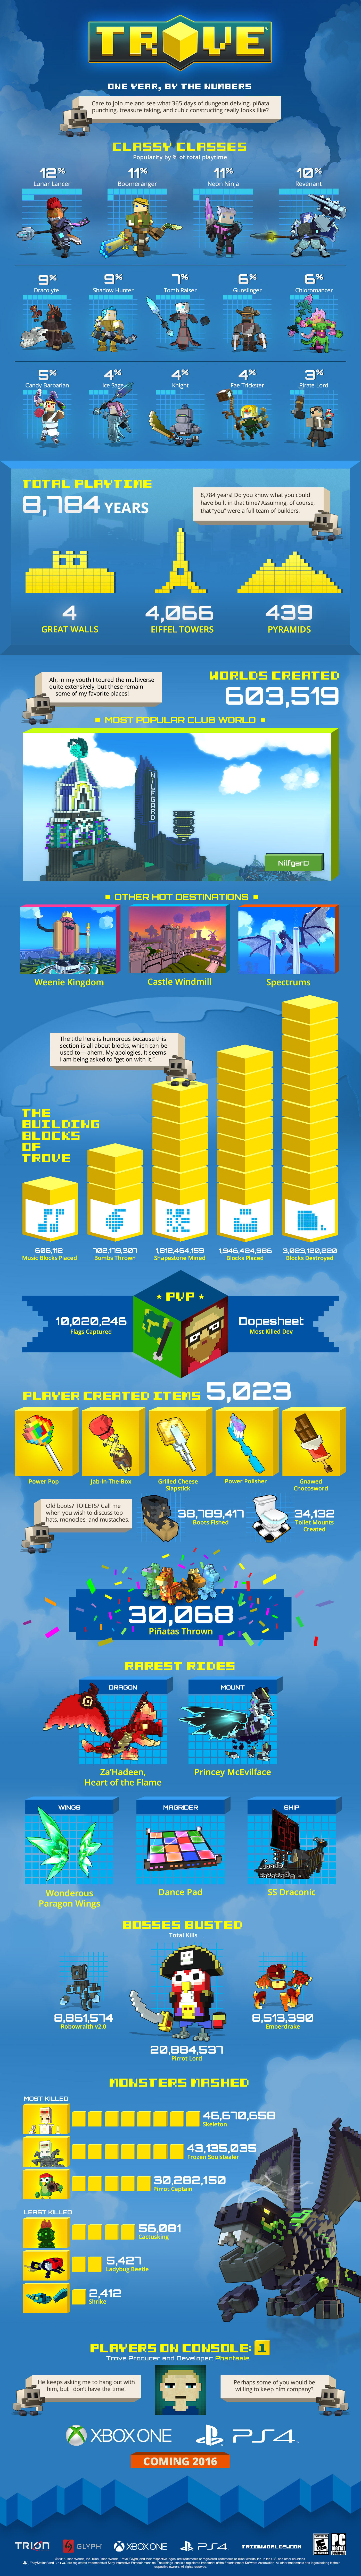 TROVE_infographic_100dpi_Final